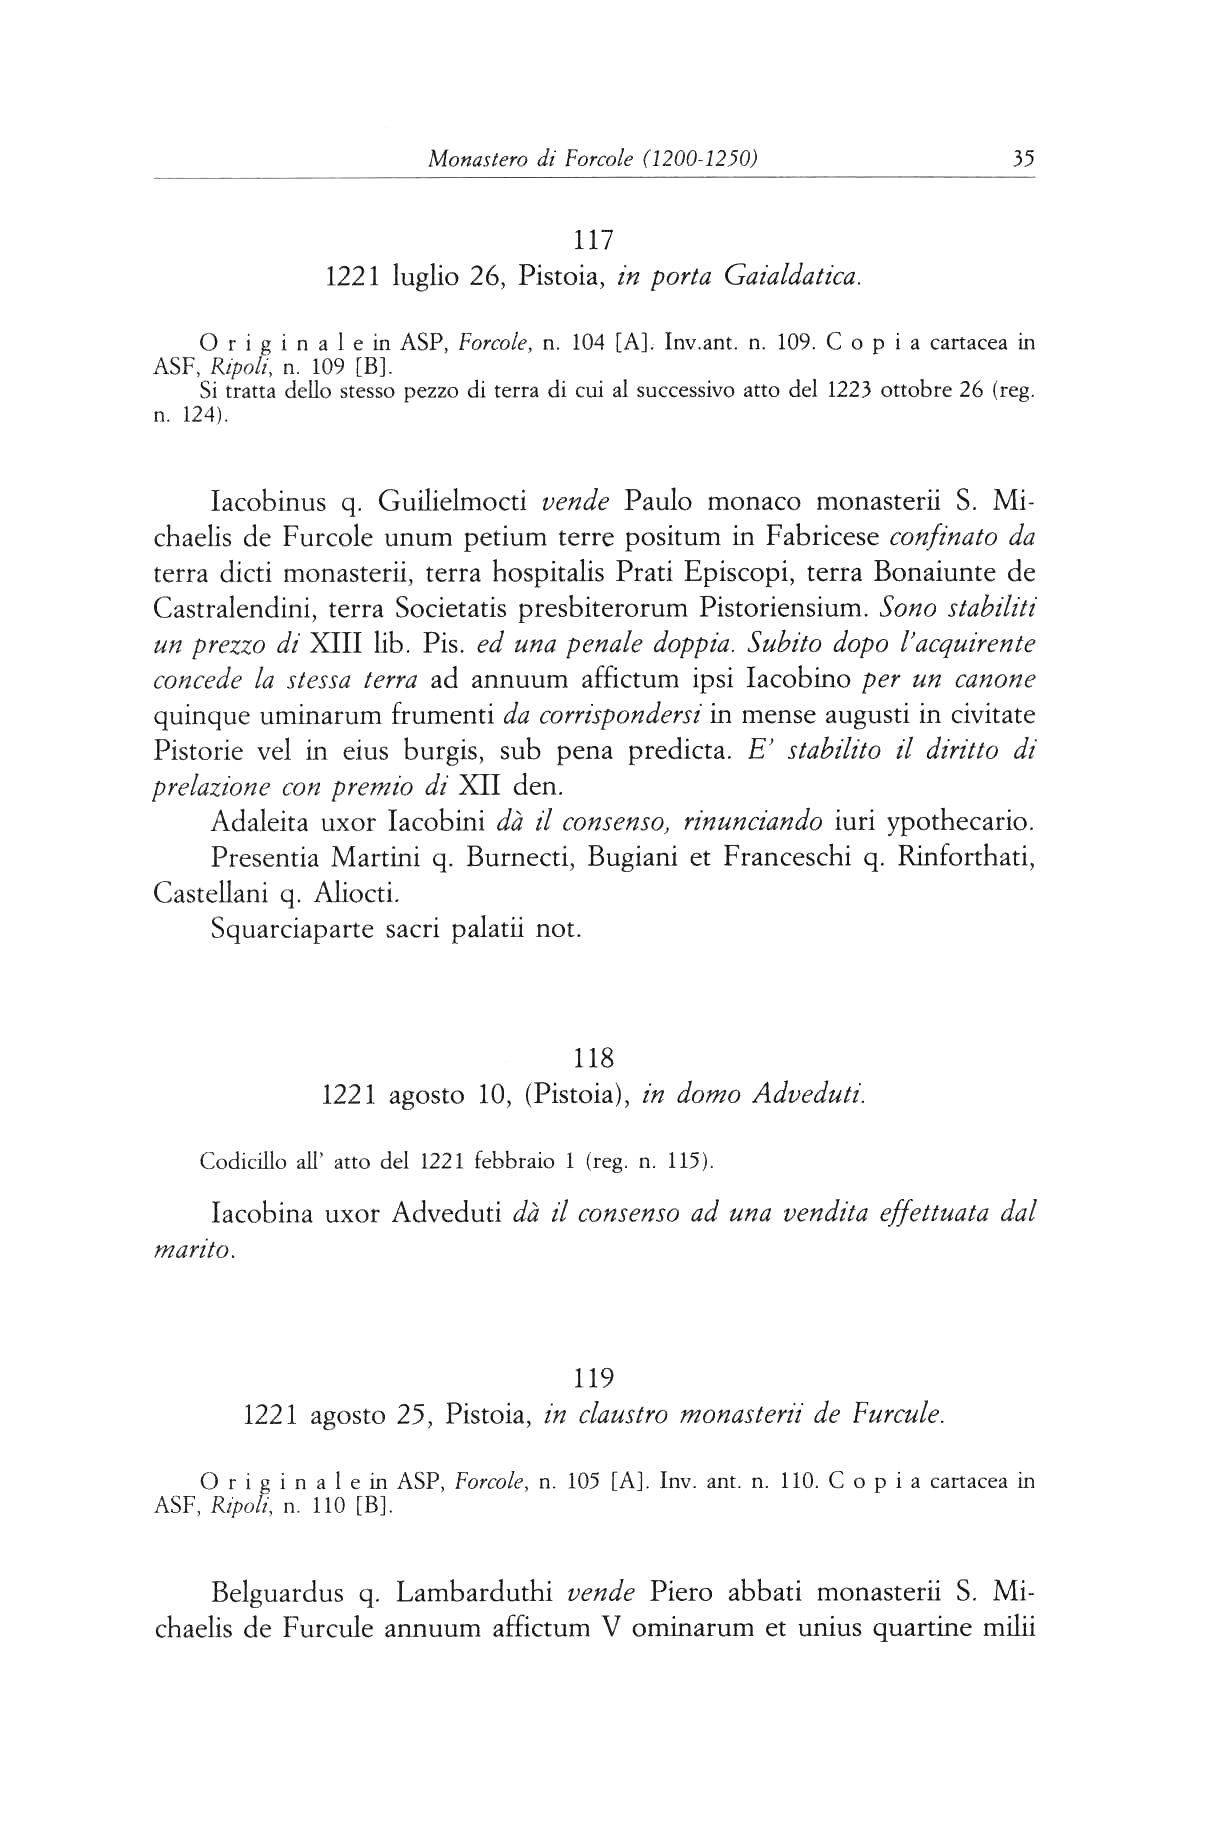 Monastero Forcole 0035.jpg